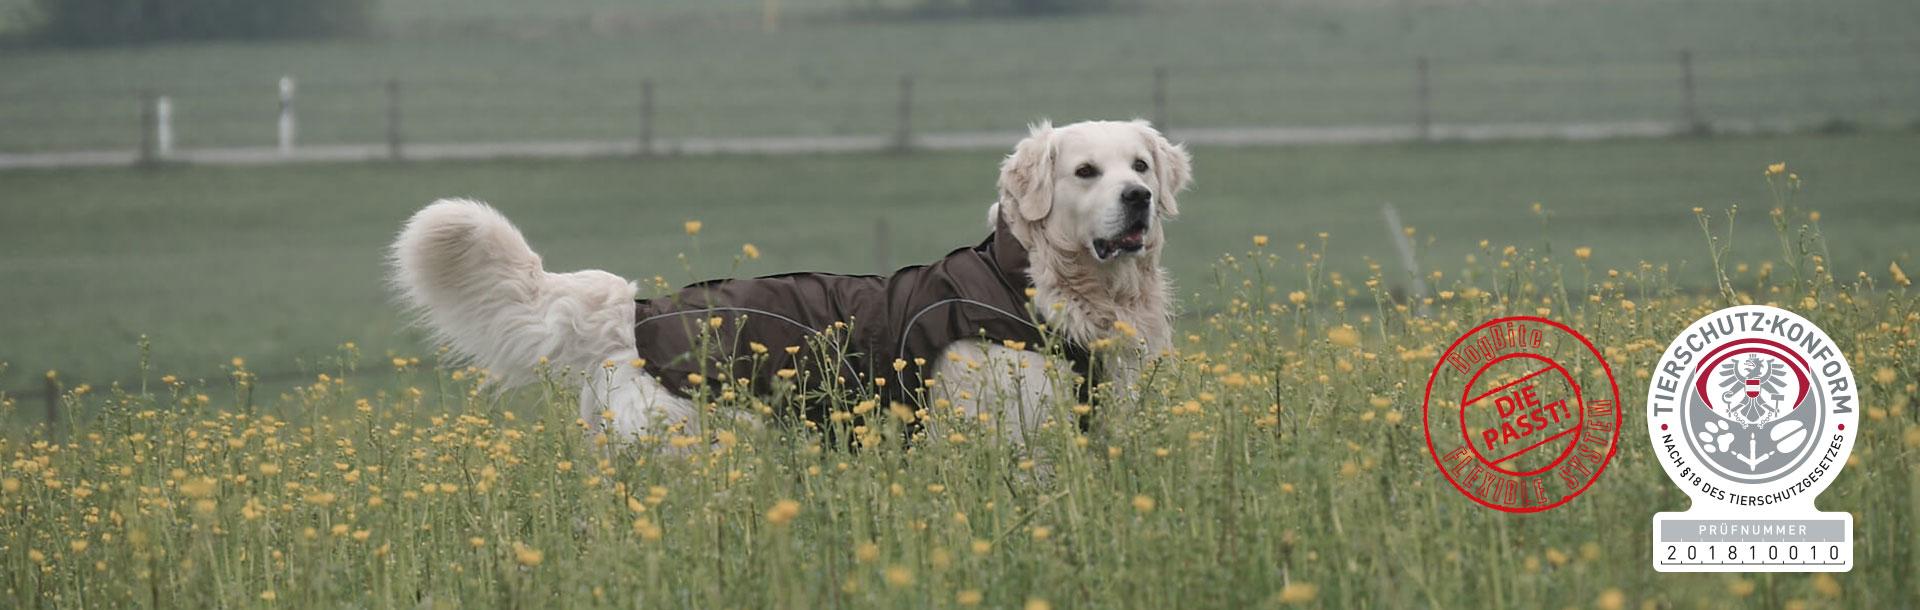 DogBite Hundejacken, Bild 2